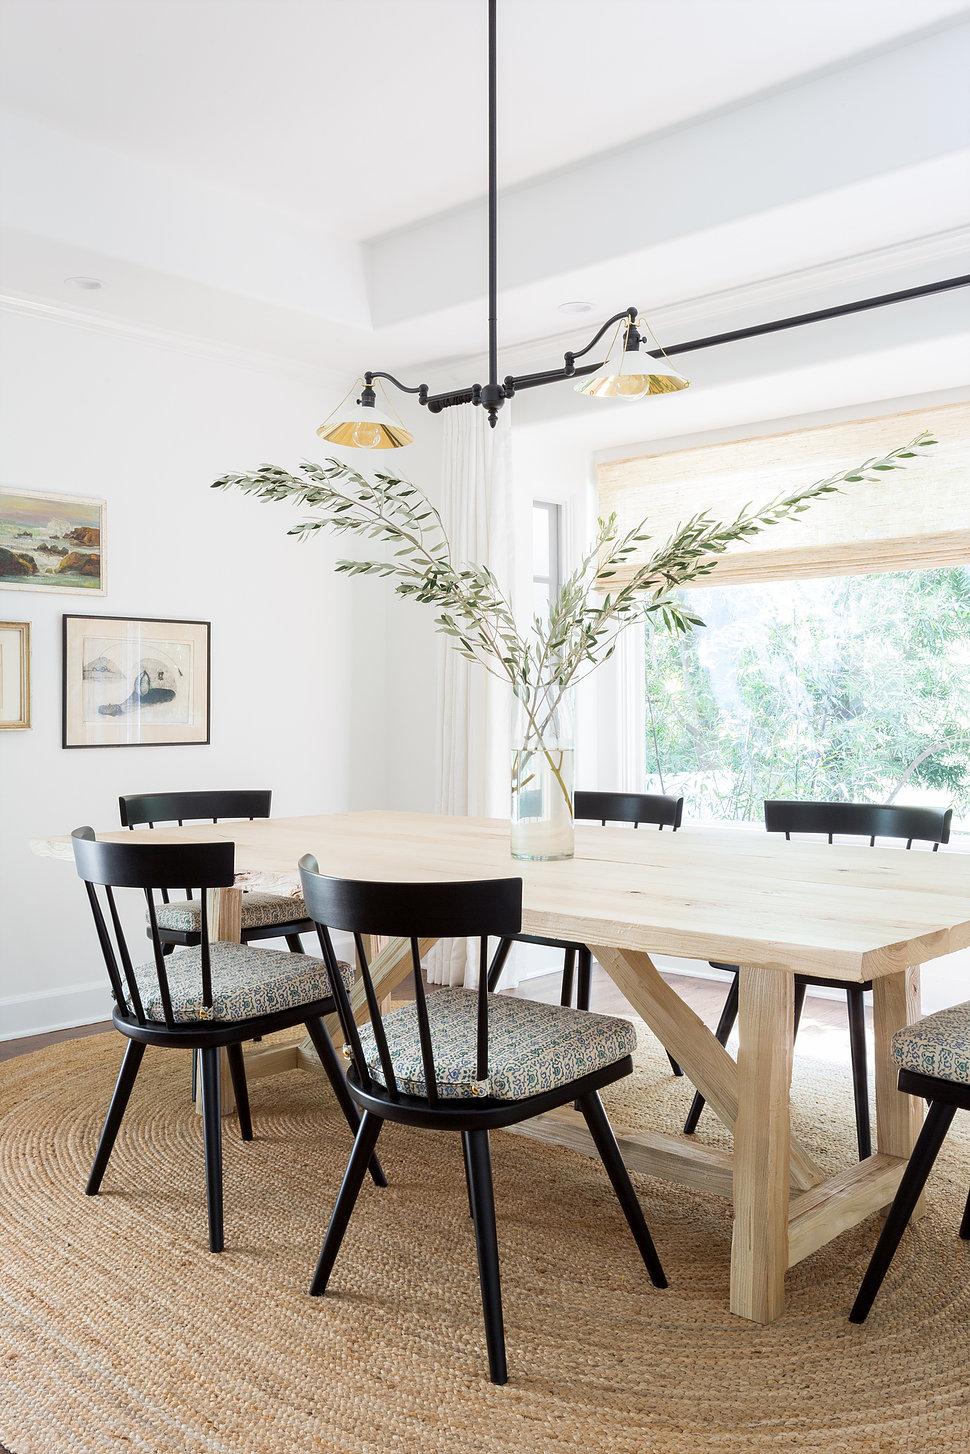 Design by  JDP Interiors , Photography  Amy Bartlam